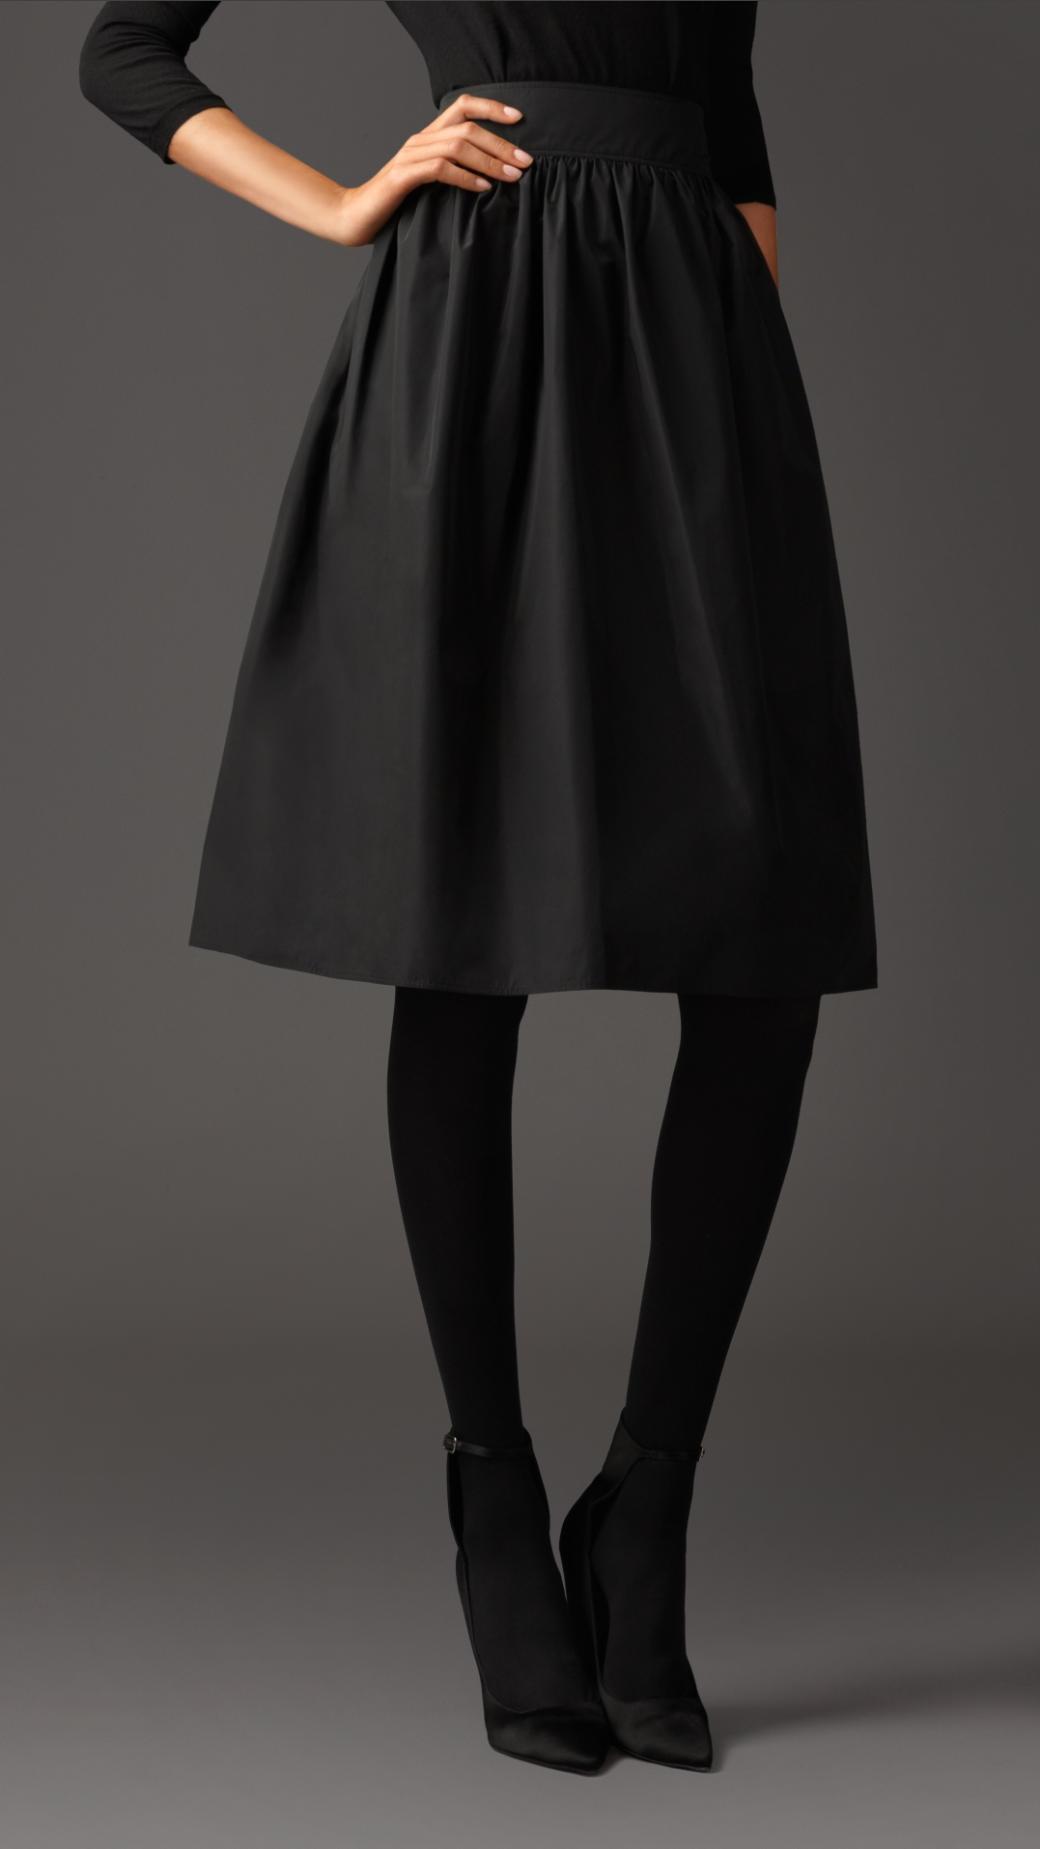 Burberry Gathered Taffeta Skirt in Black | Lyst